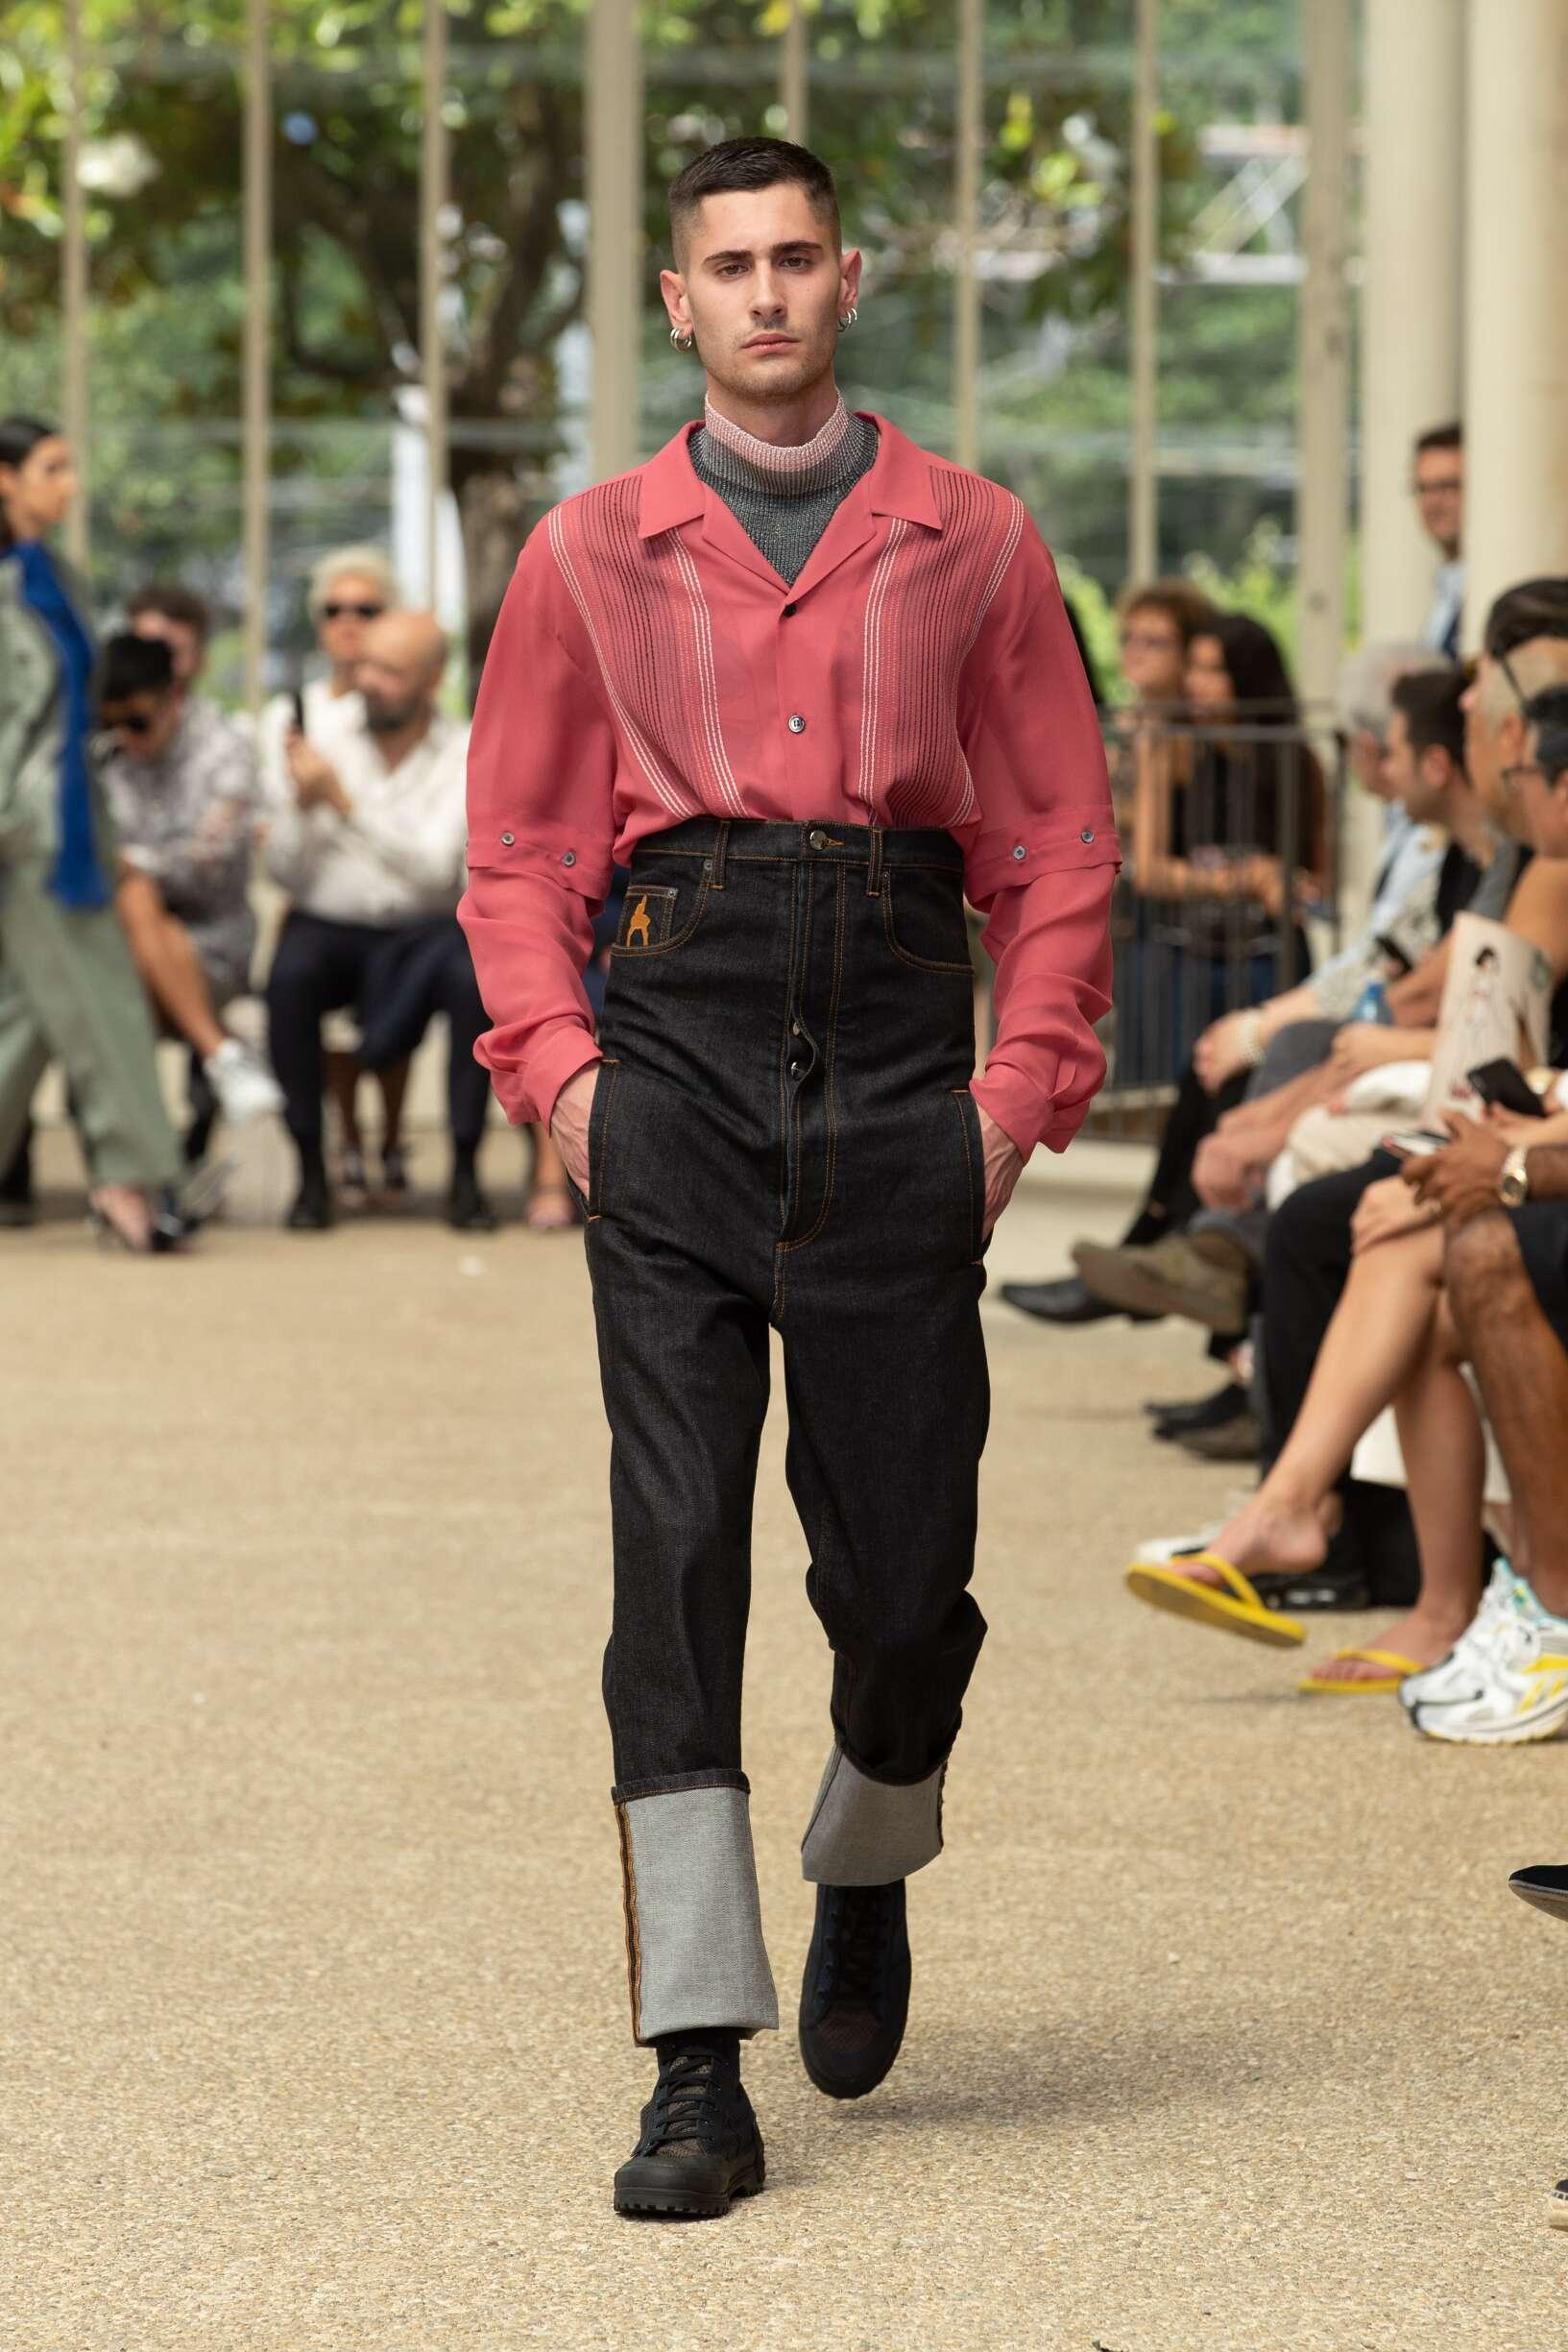 SS 2020 Marco De vincenzo Fashion Show Florence